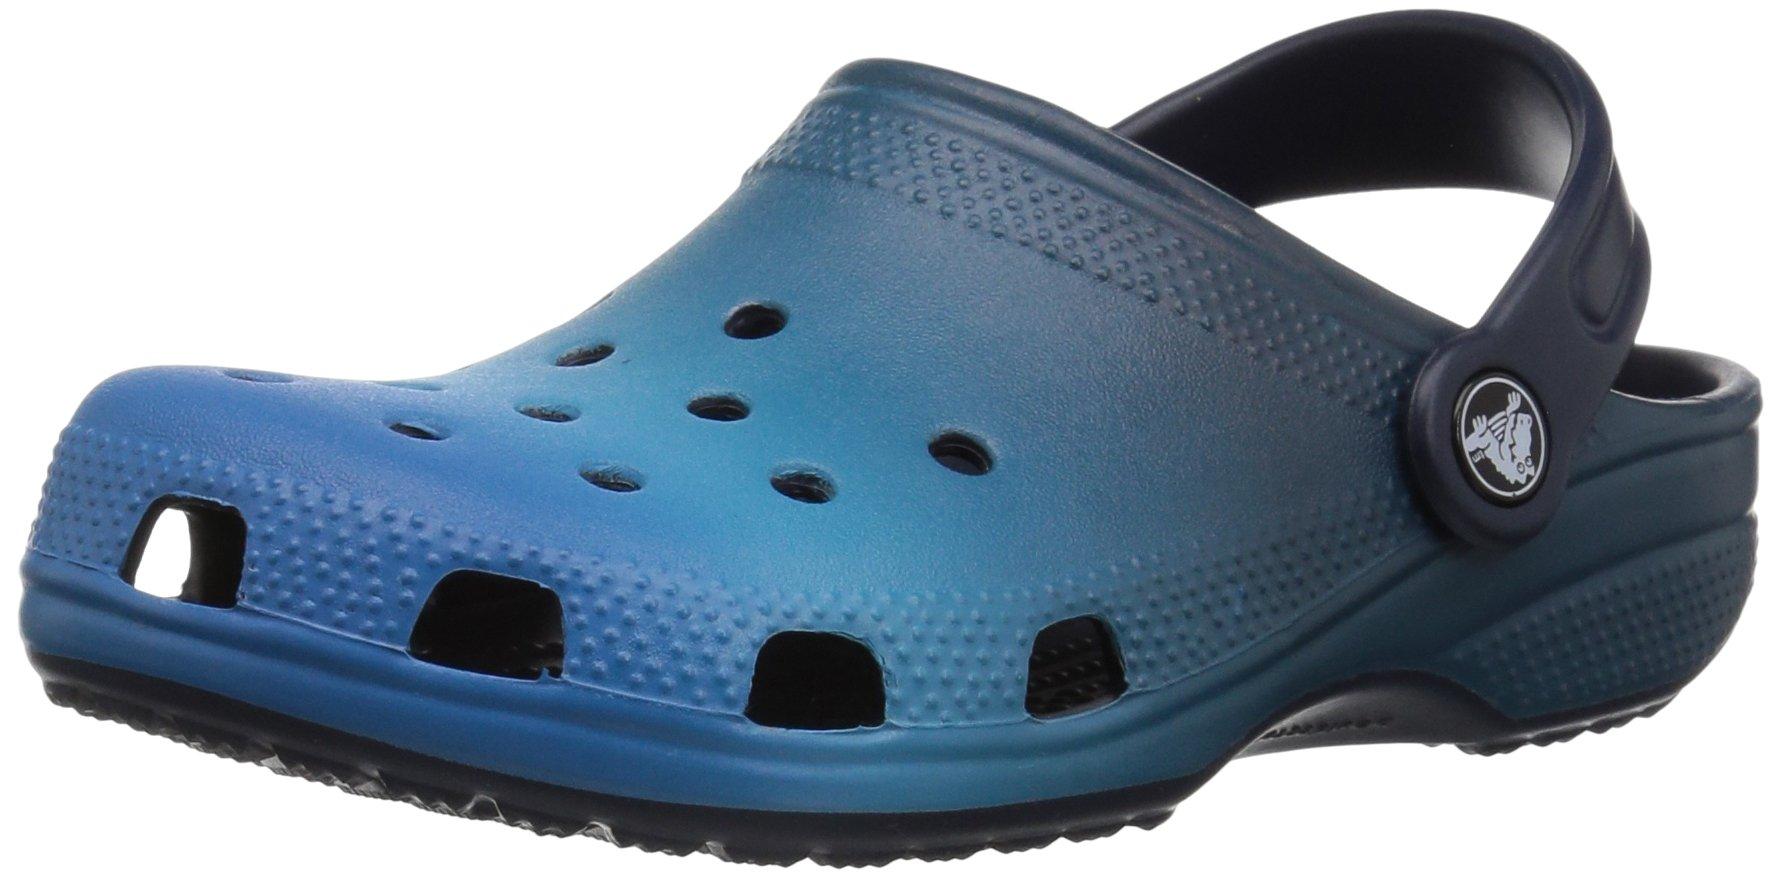 Crocs Crocband Fun Lab Light-Up Clog, Blue, C10 M US Toddler